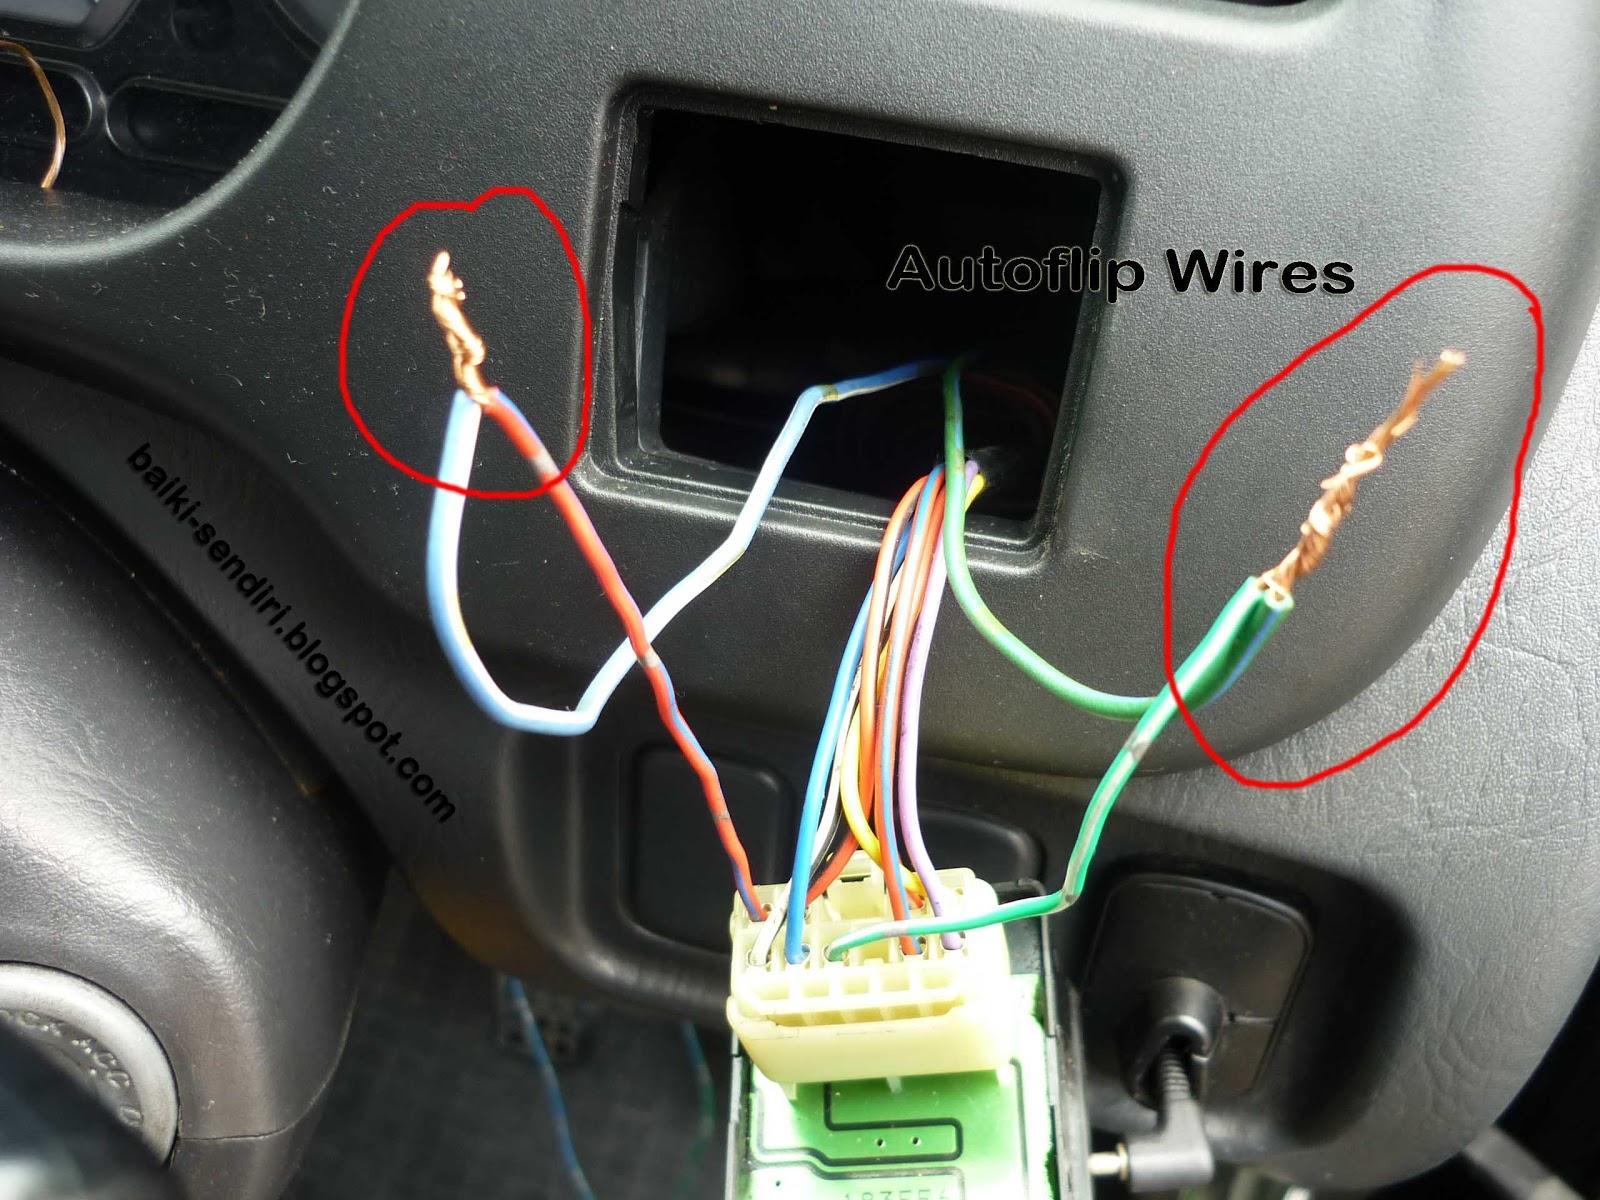 l7 wiring diagram melex golf cart diy fix on your own daihatsu perodua kelisa autoflip installation guide